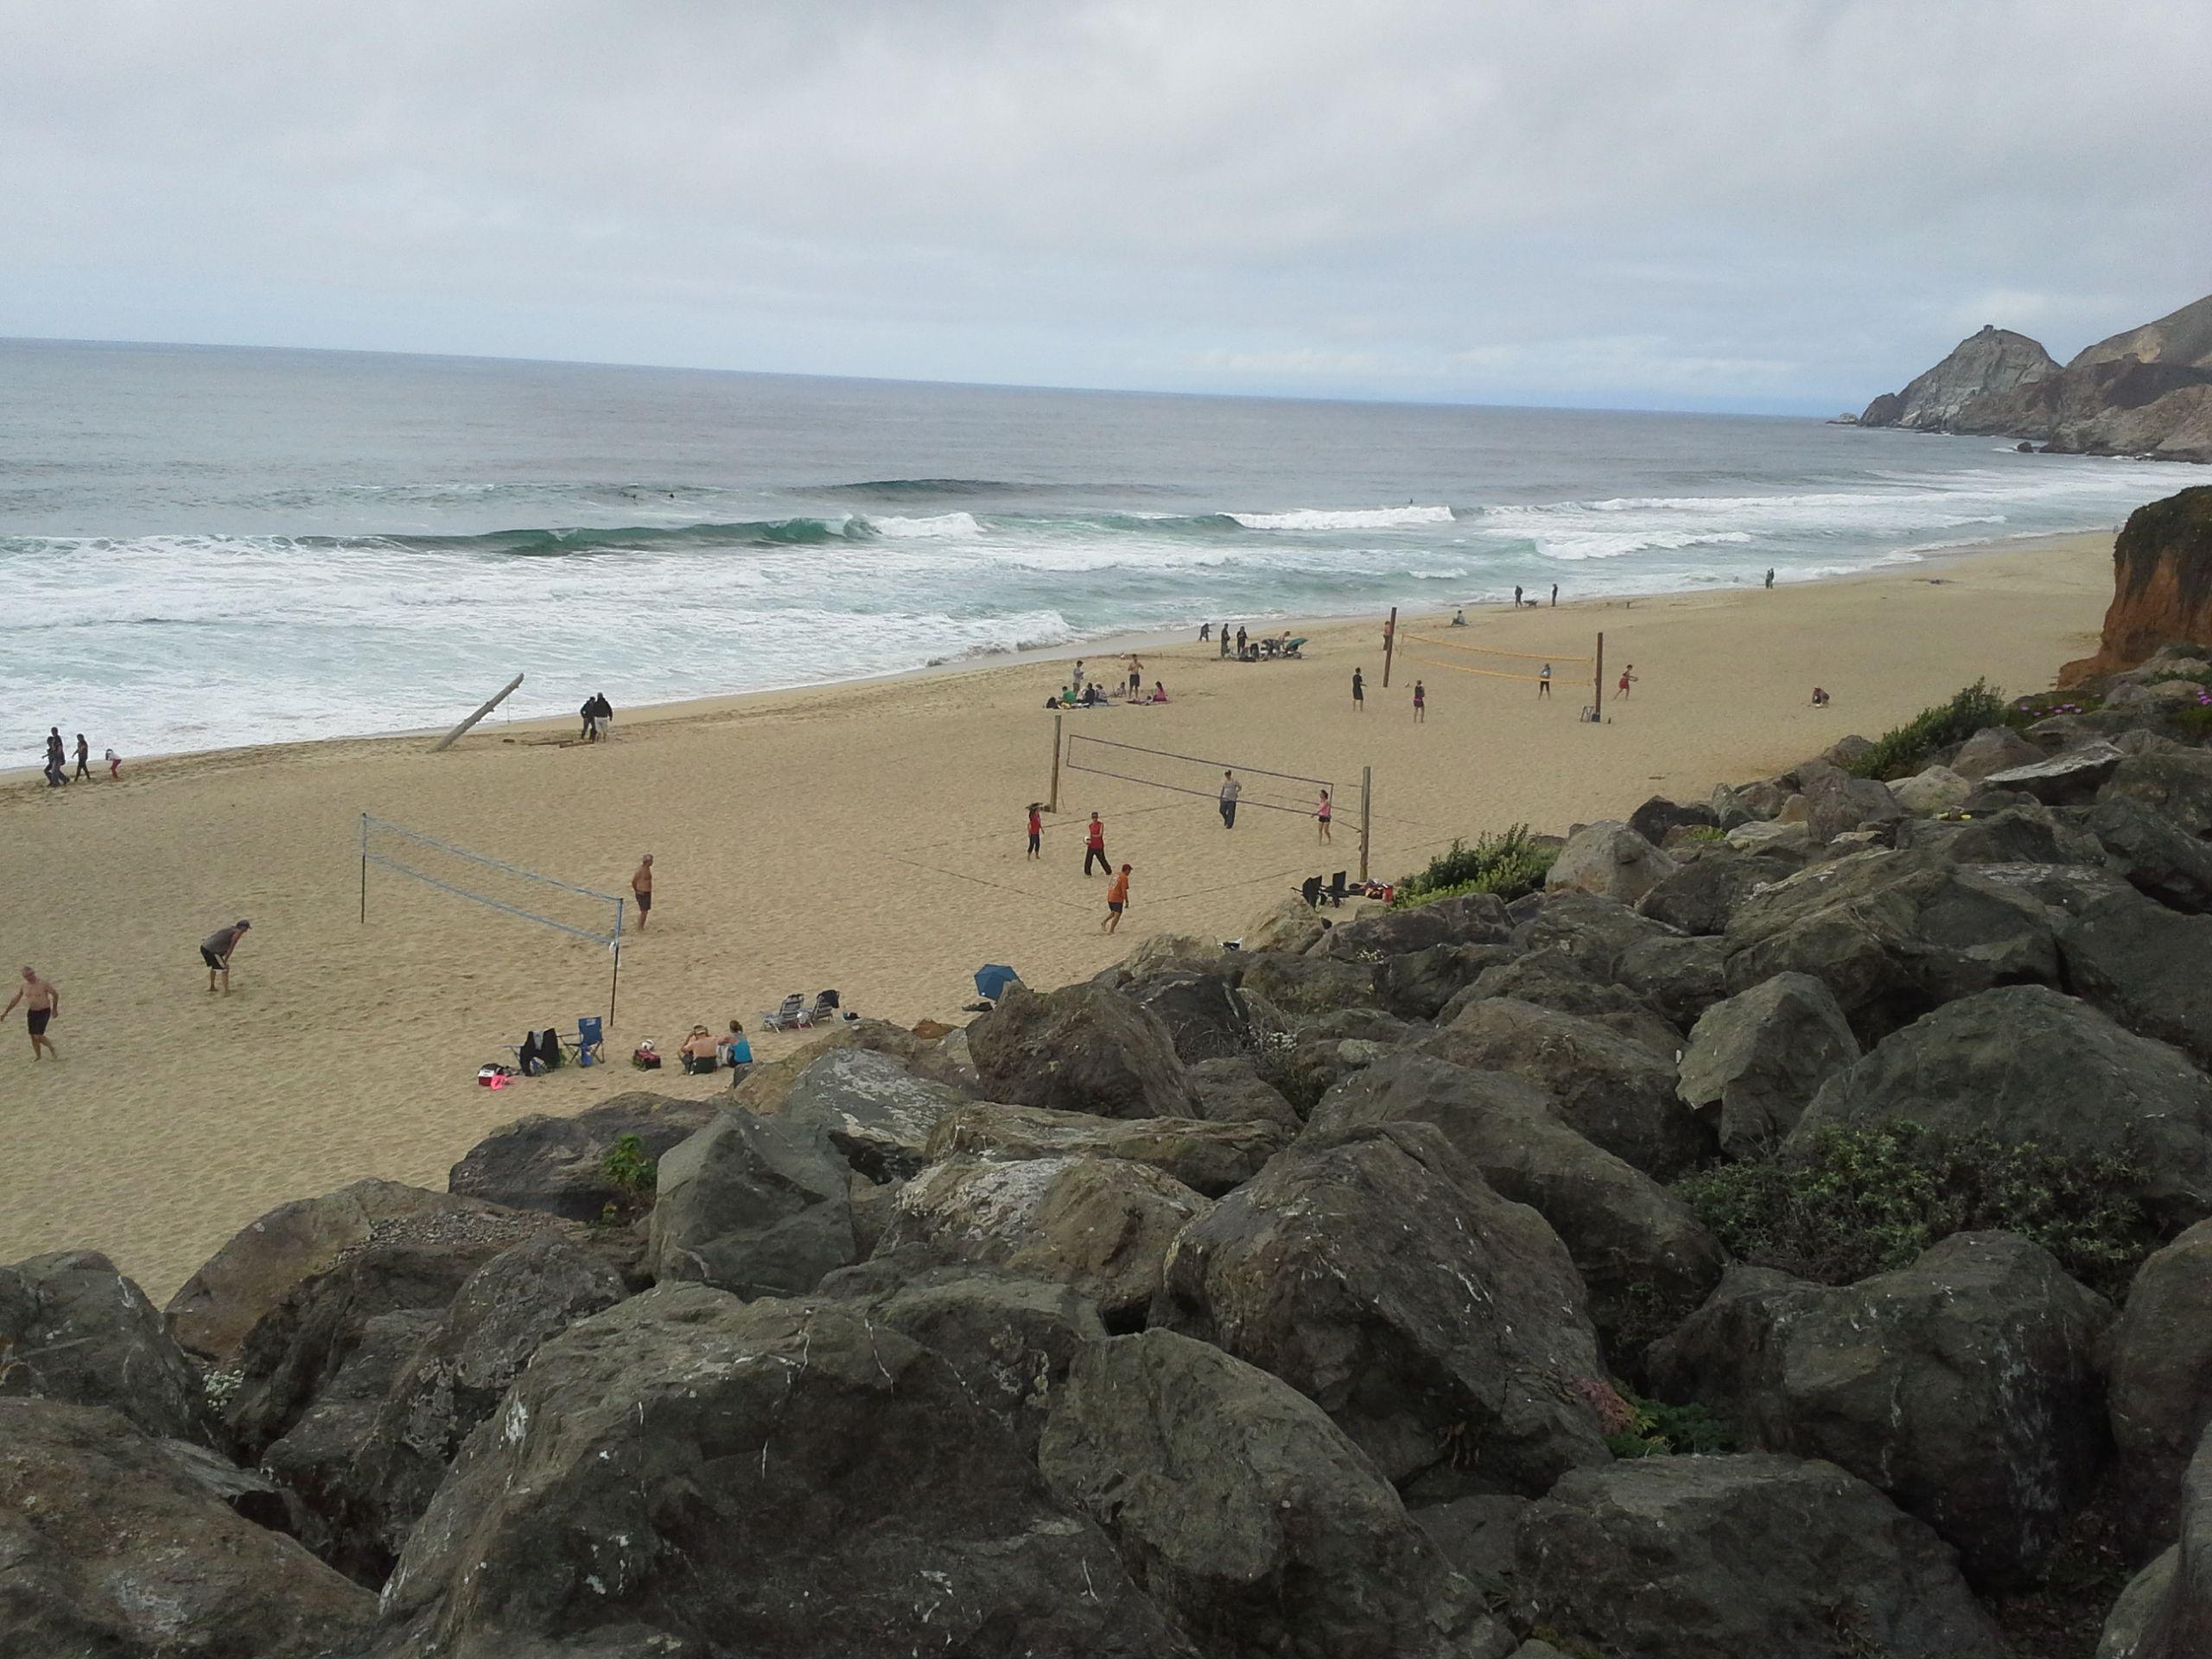 MP Volleyball (San Francisco Bay Area)